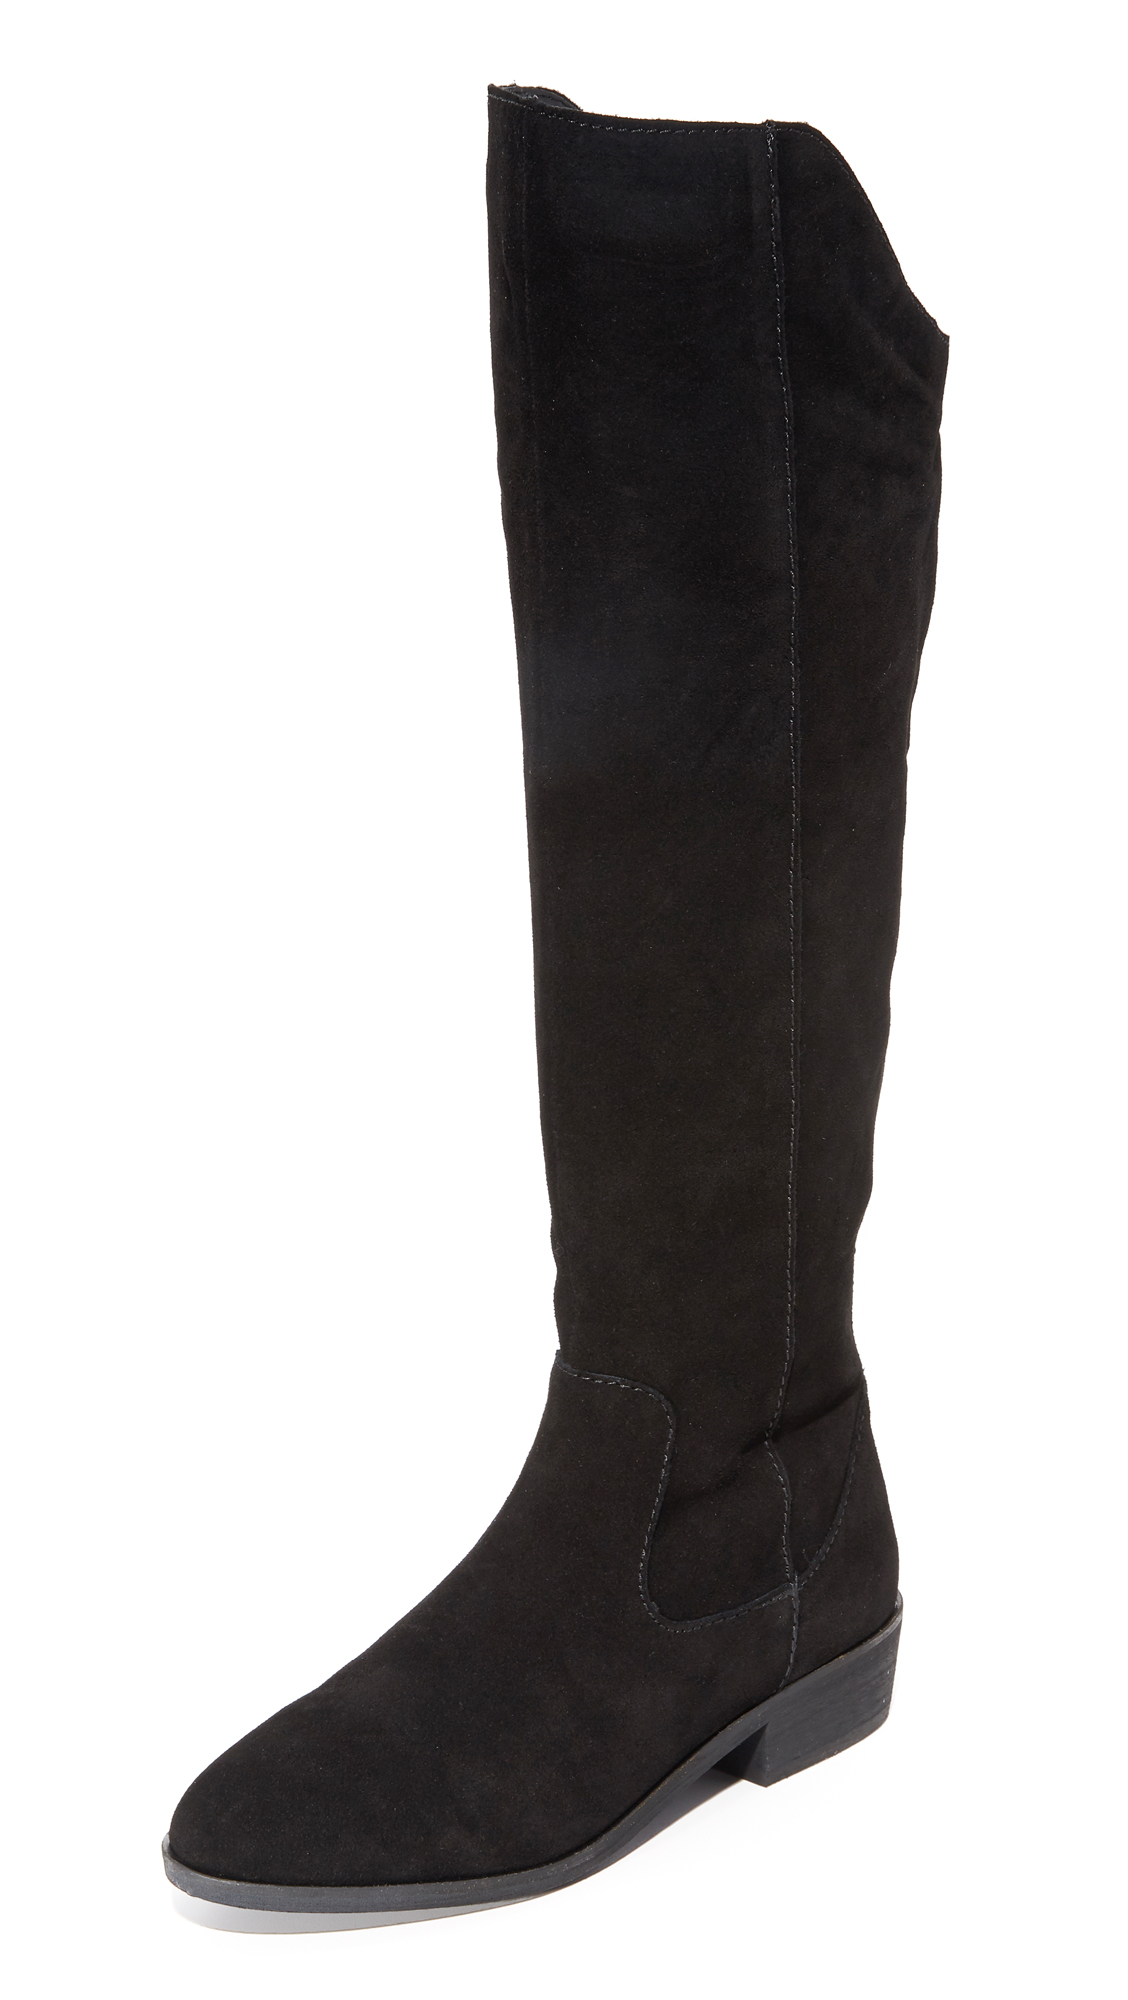 Steven Emmery Tall Boots - Black